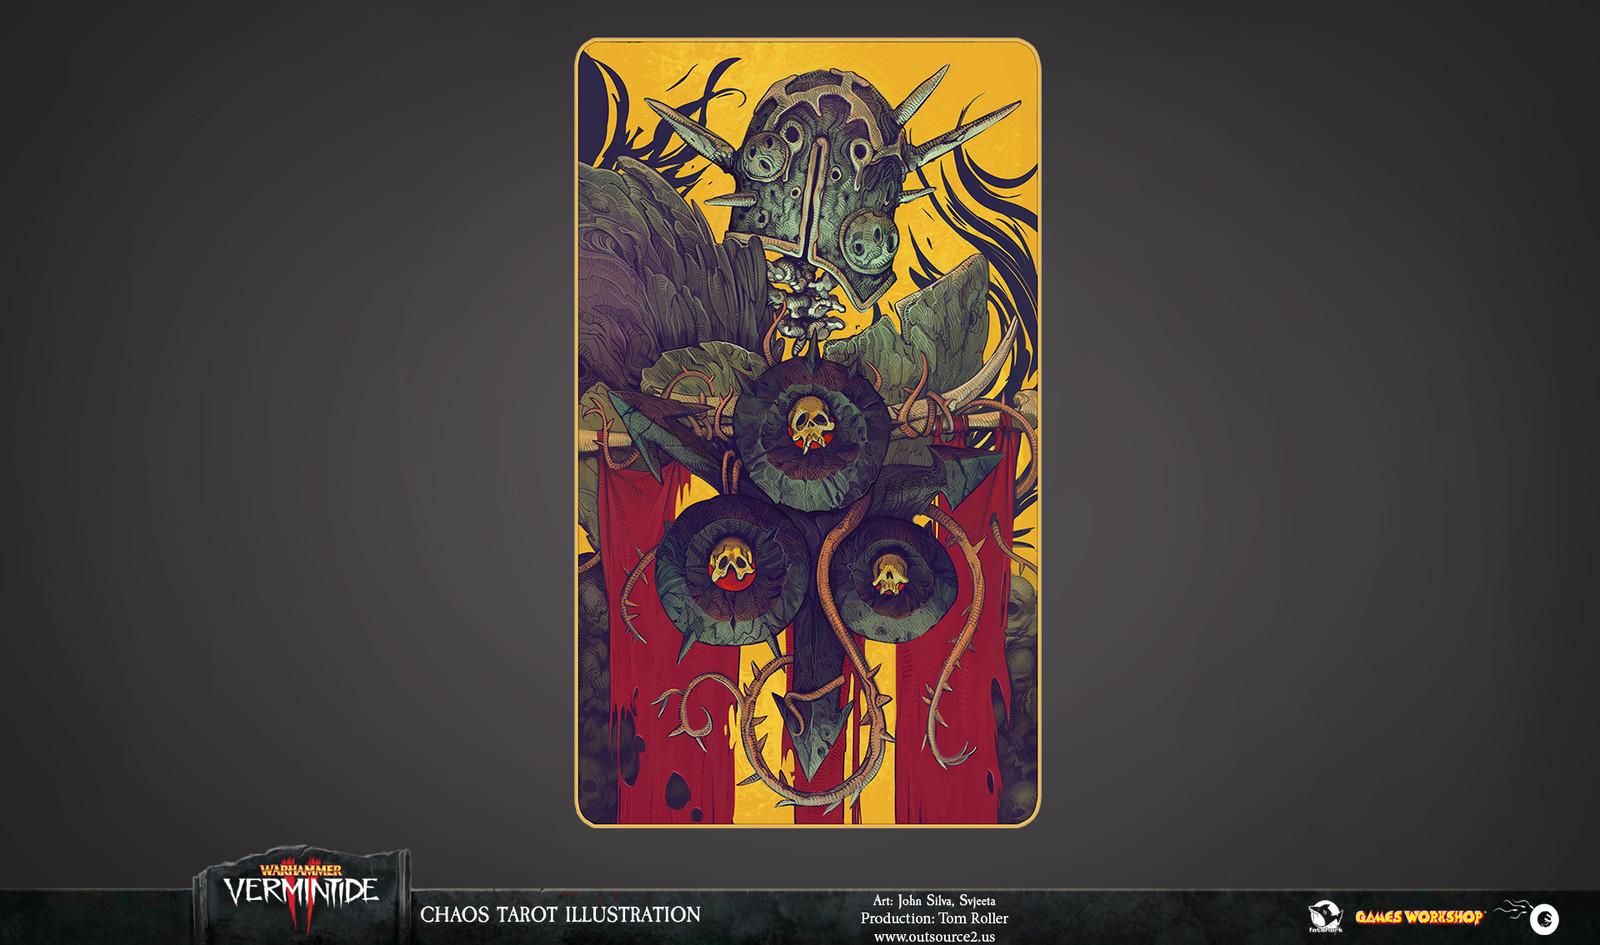 The illustration uses the Chaos symbols heavily.